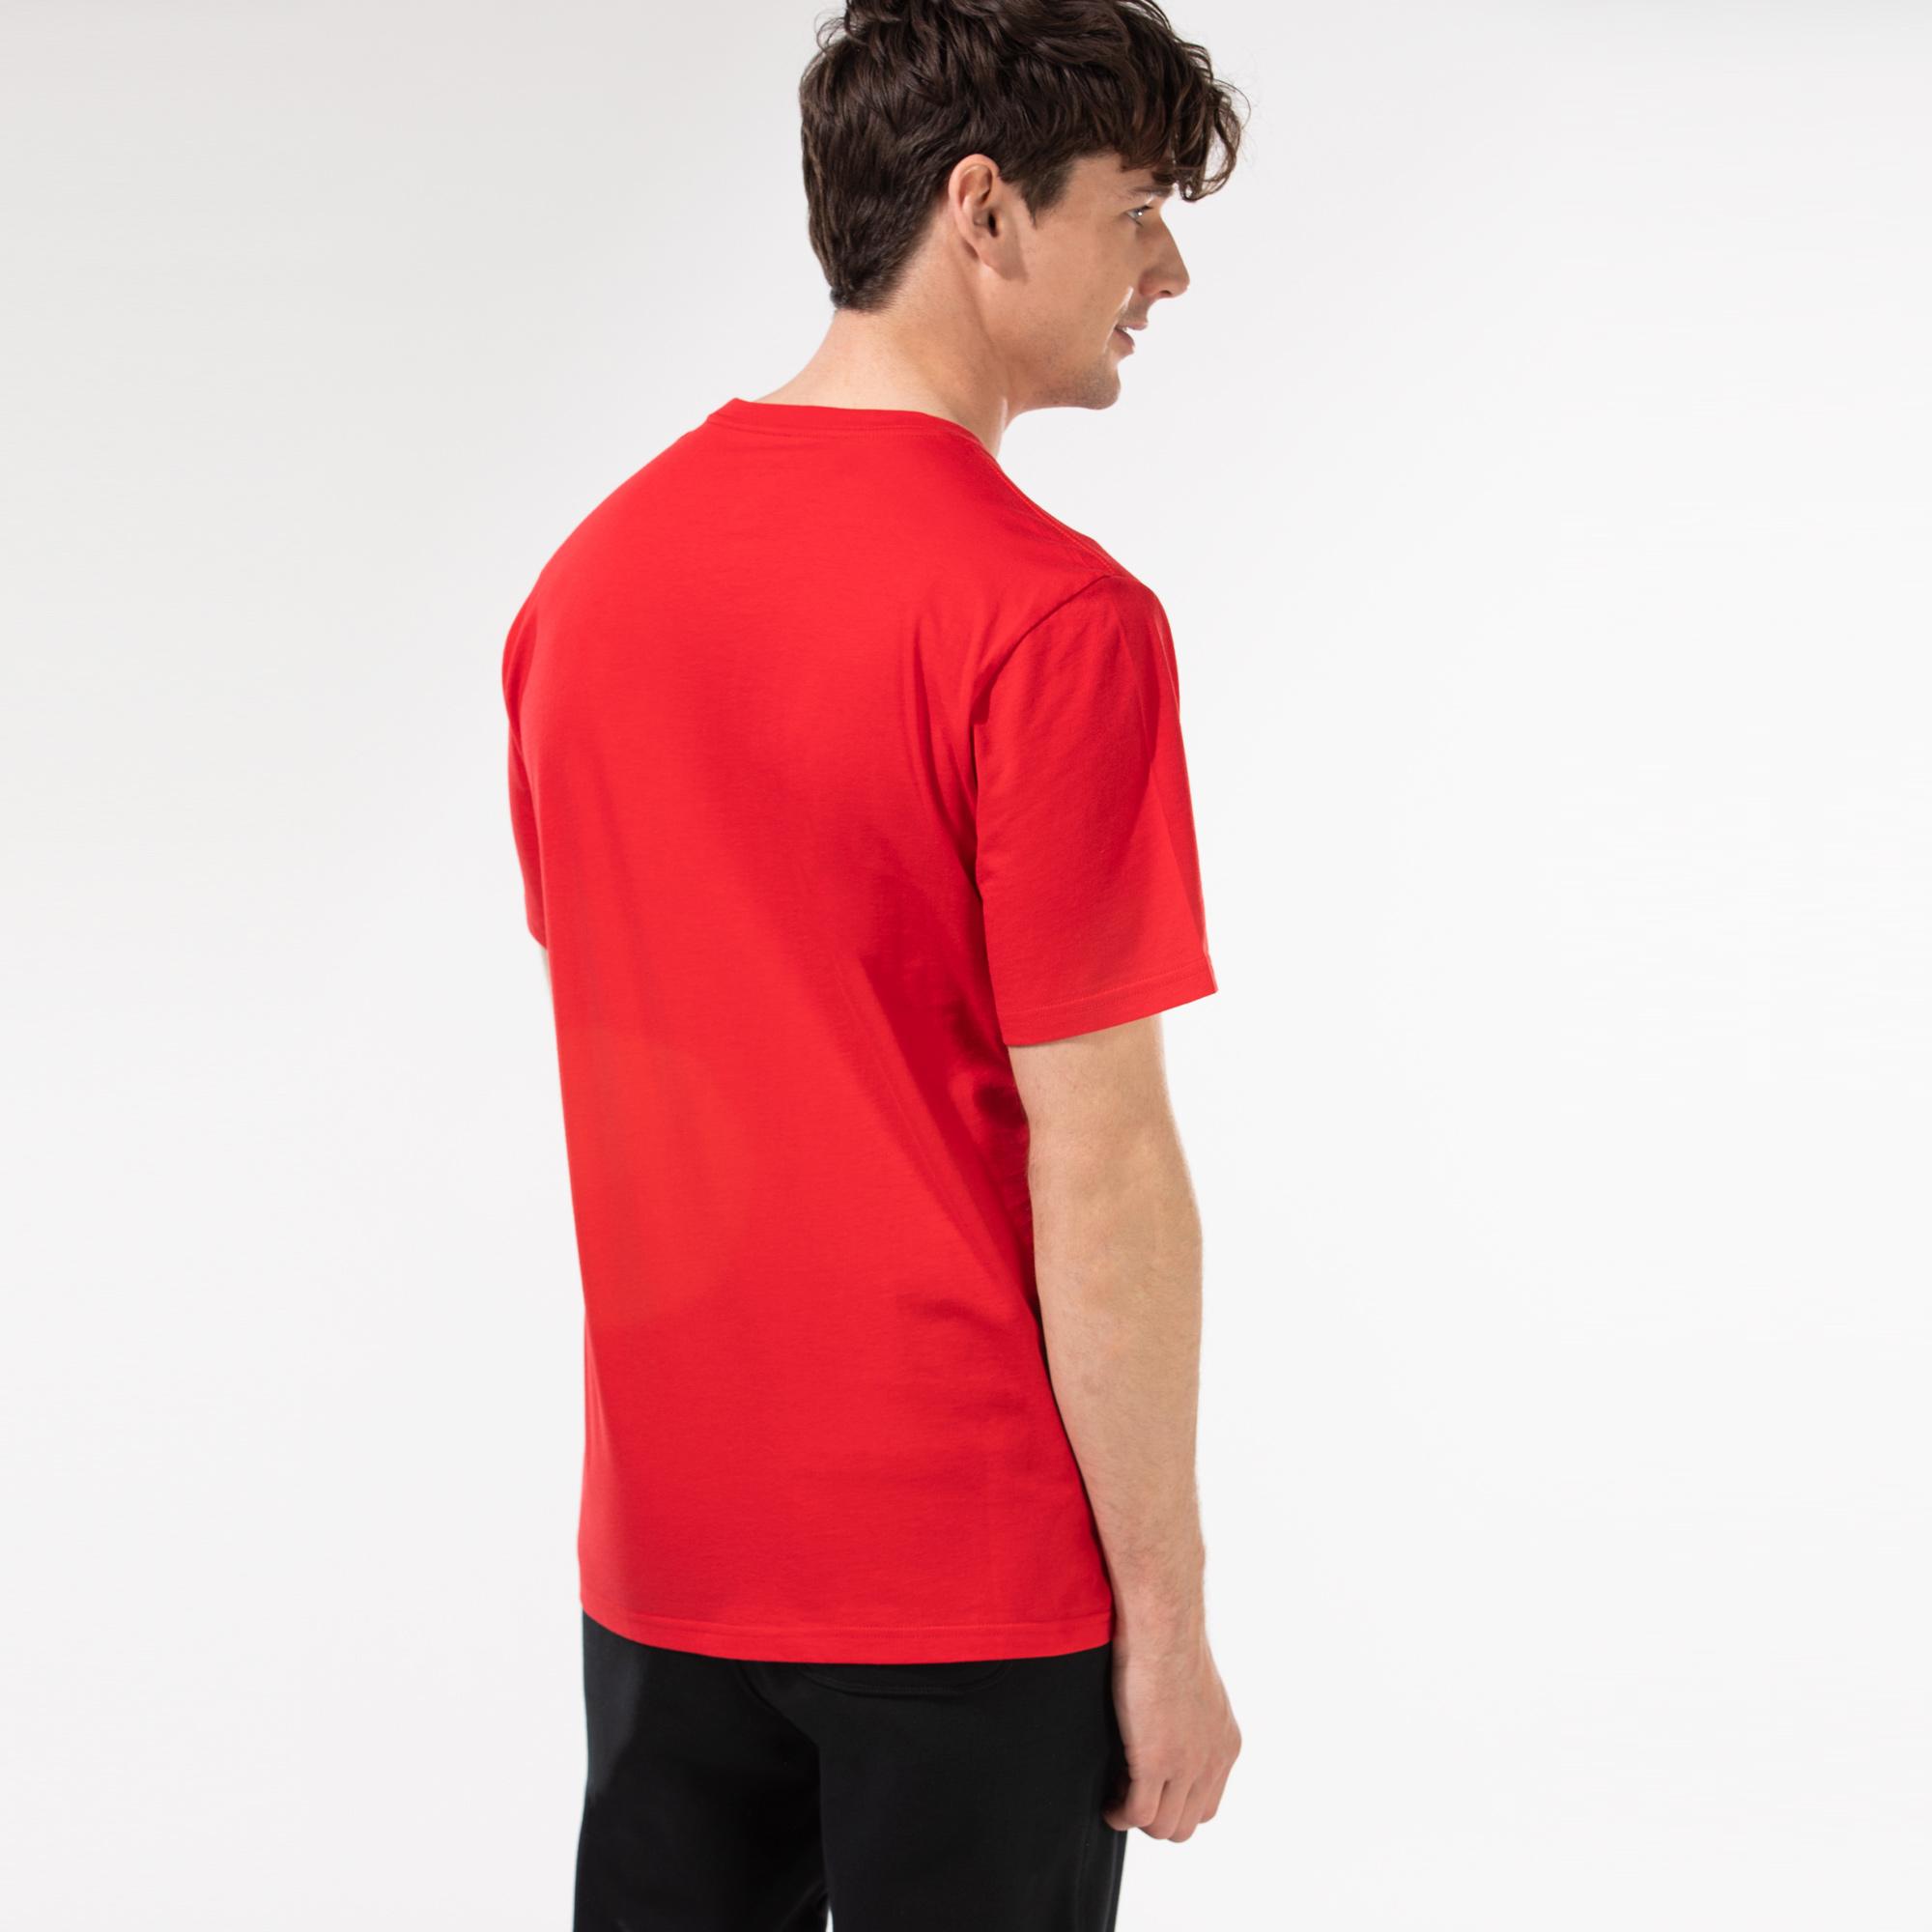 Converse Nova Chuck Patch Erkek Kırmızı T-Shirt